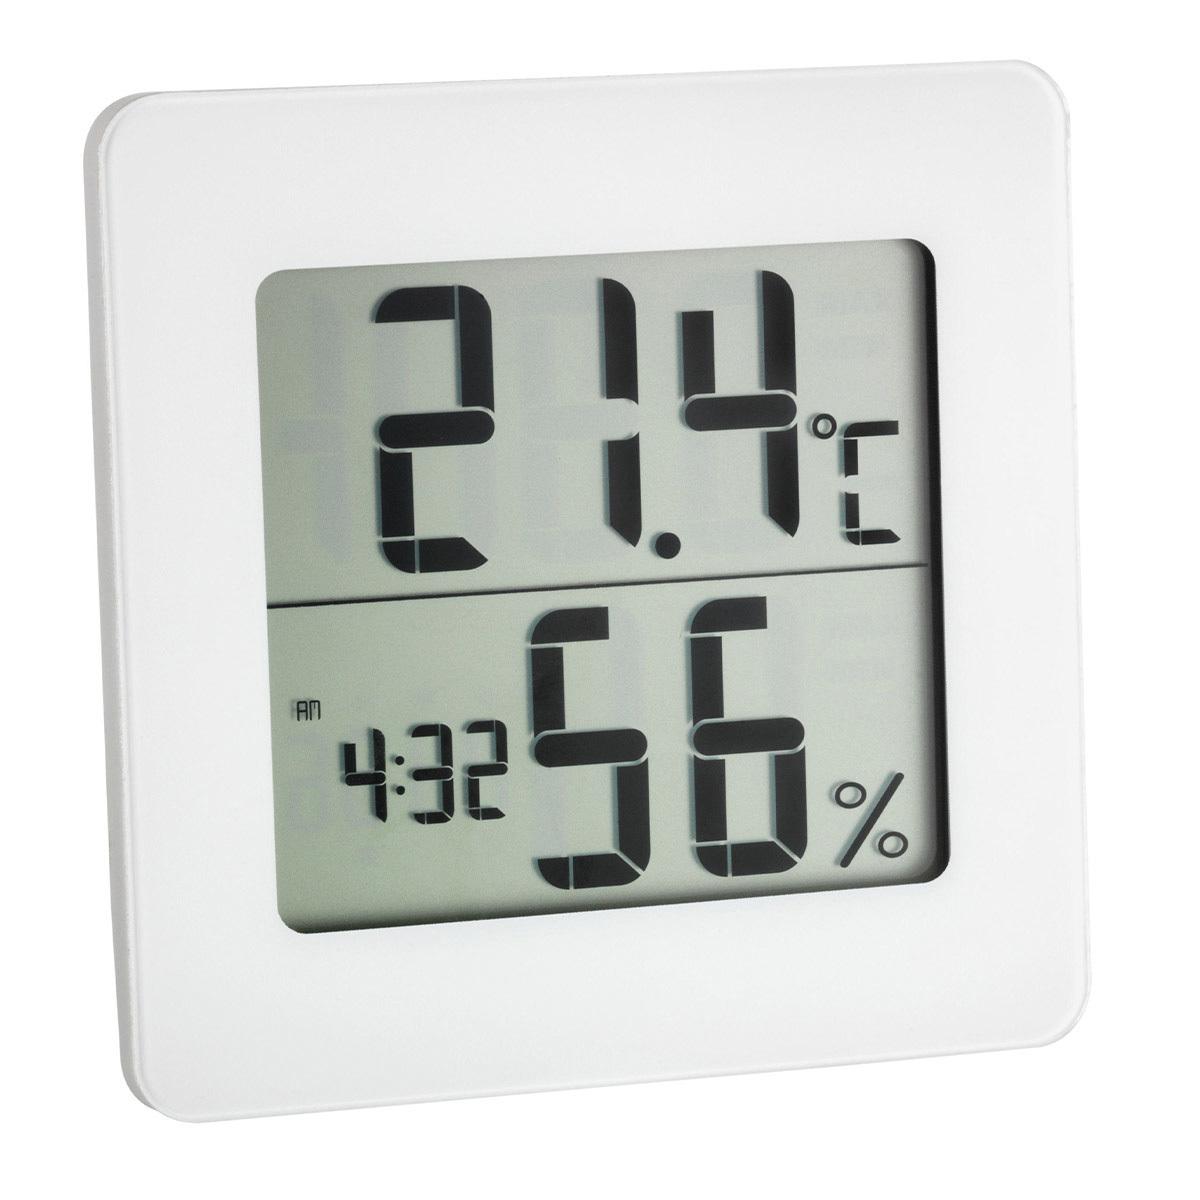 30-5033-02-digitales-thermo-hygrometer-1200x1200px.jpg